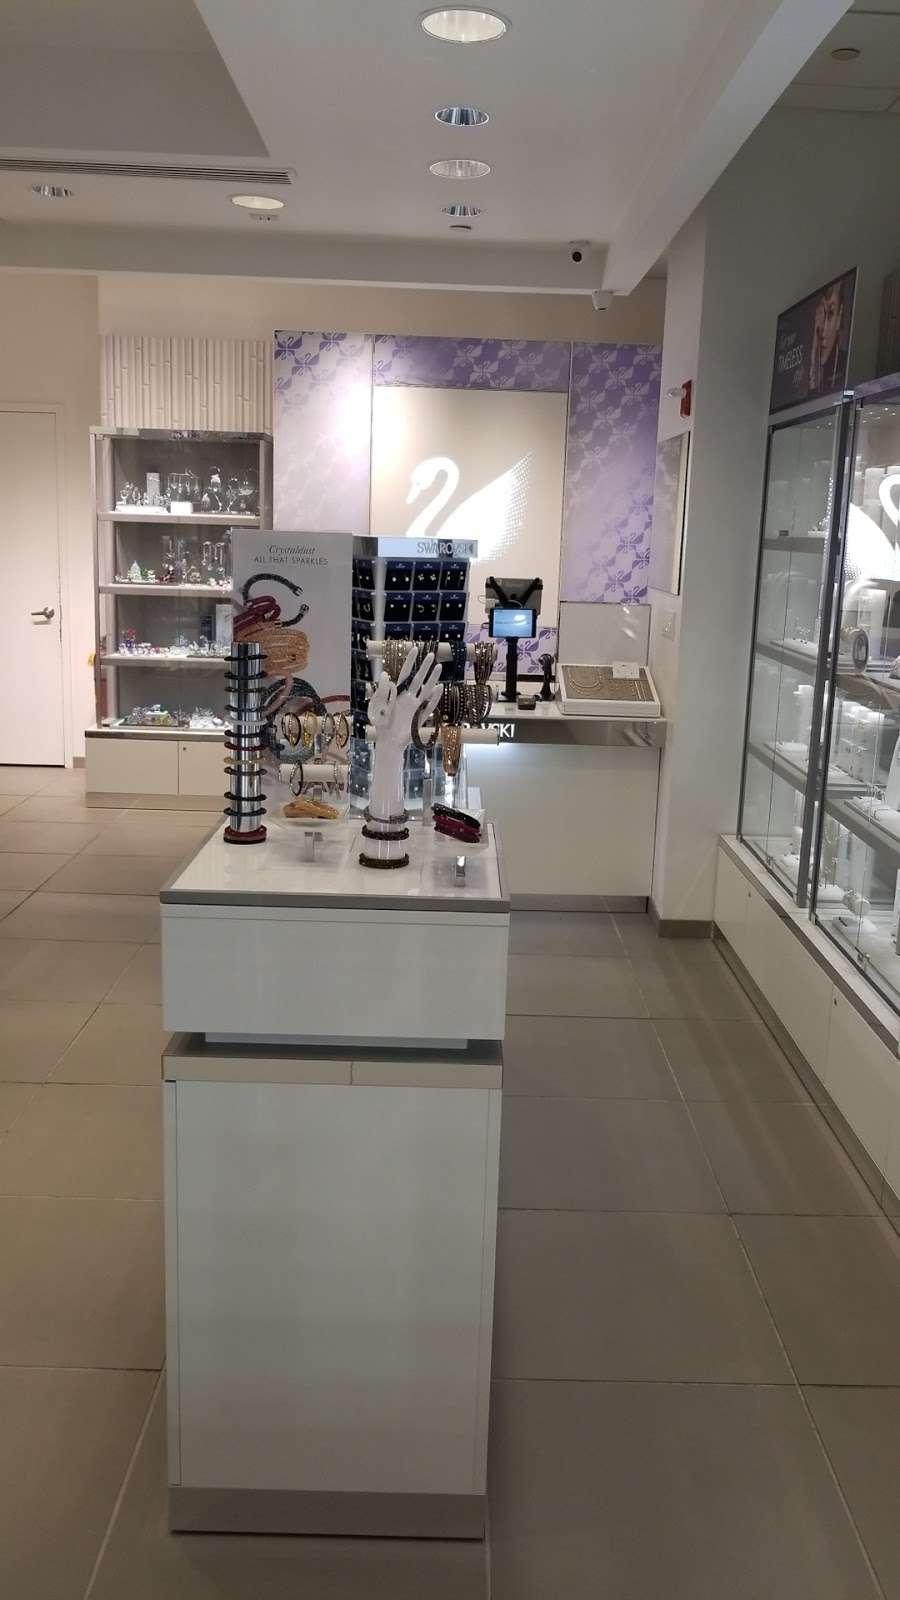 SWAROVSKI - jewelry store  | Photo 4 of 5 | Address: La Guardia Airport Delta Terminal C, East Elmhurst, NY 11371, USA | Phone: (929) 202-4092